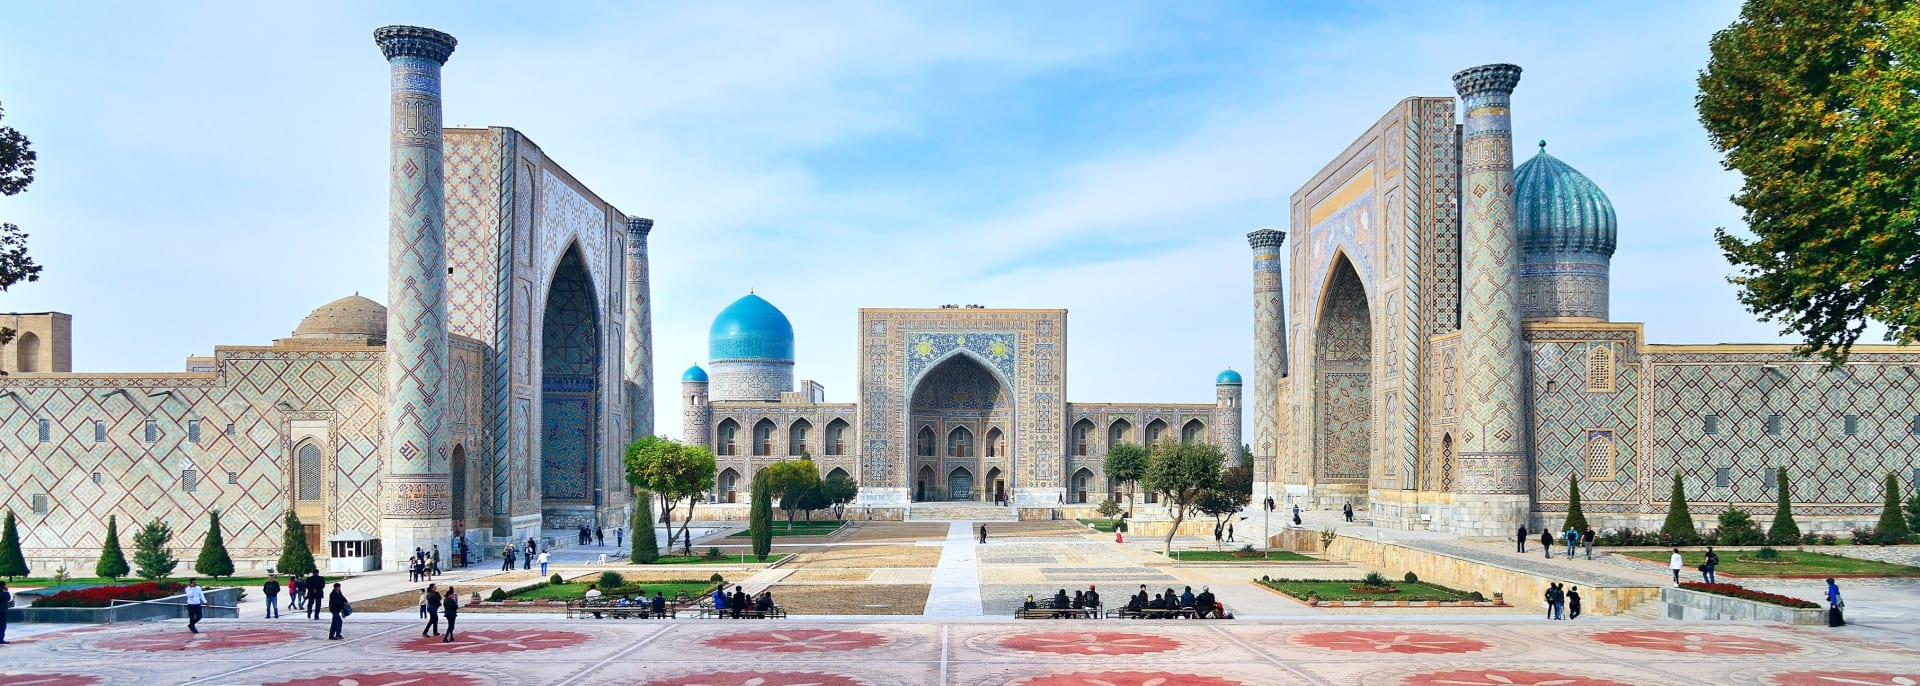 Registan Square, Samarkand, Usbekistan